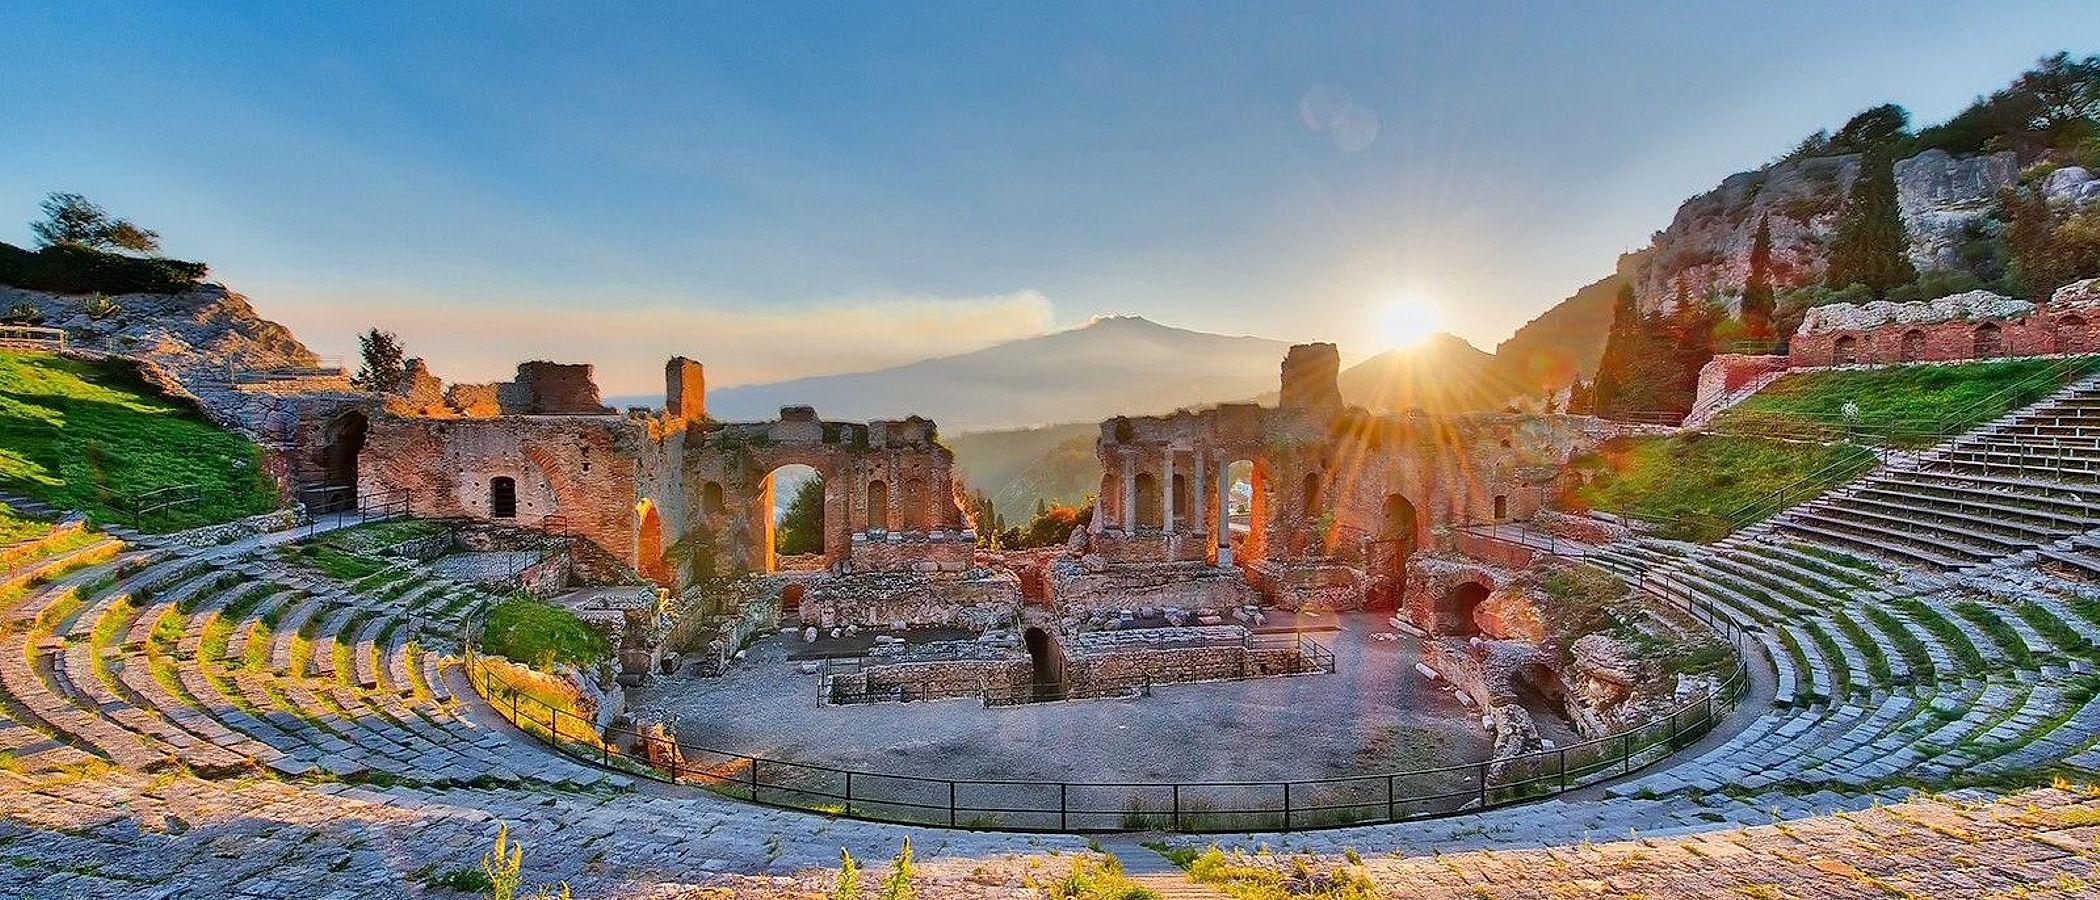 taormina-greek-theatre-at-sunset